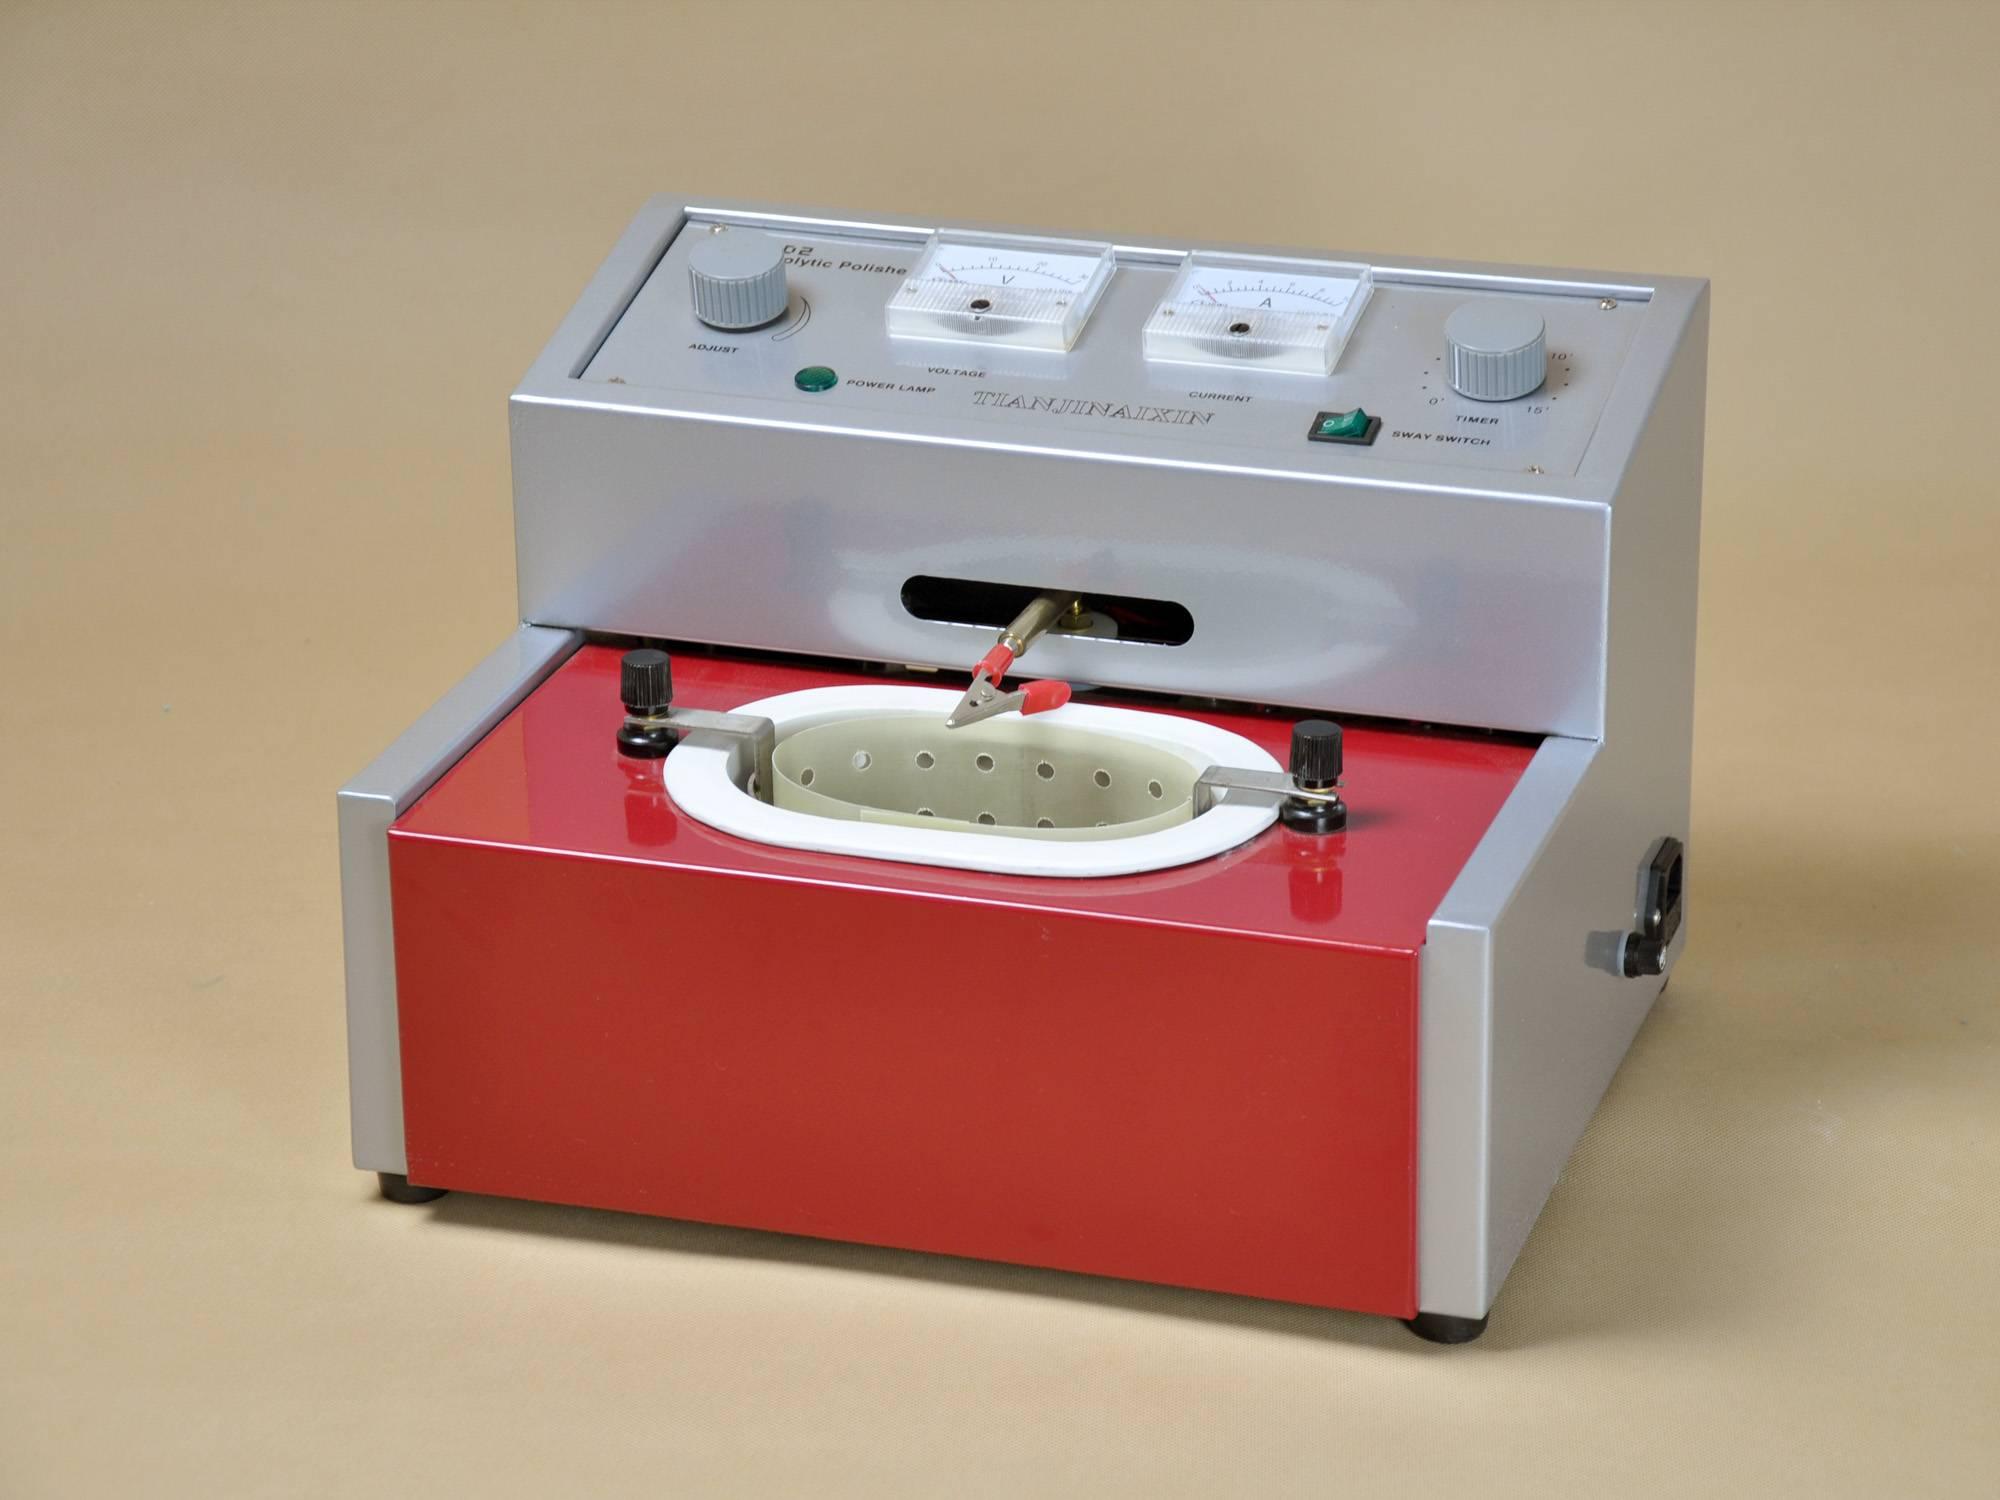 AX-D2 dental electrolytic polisher